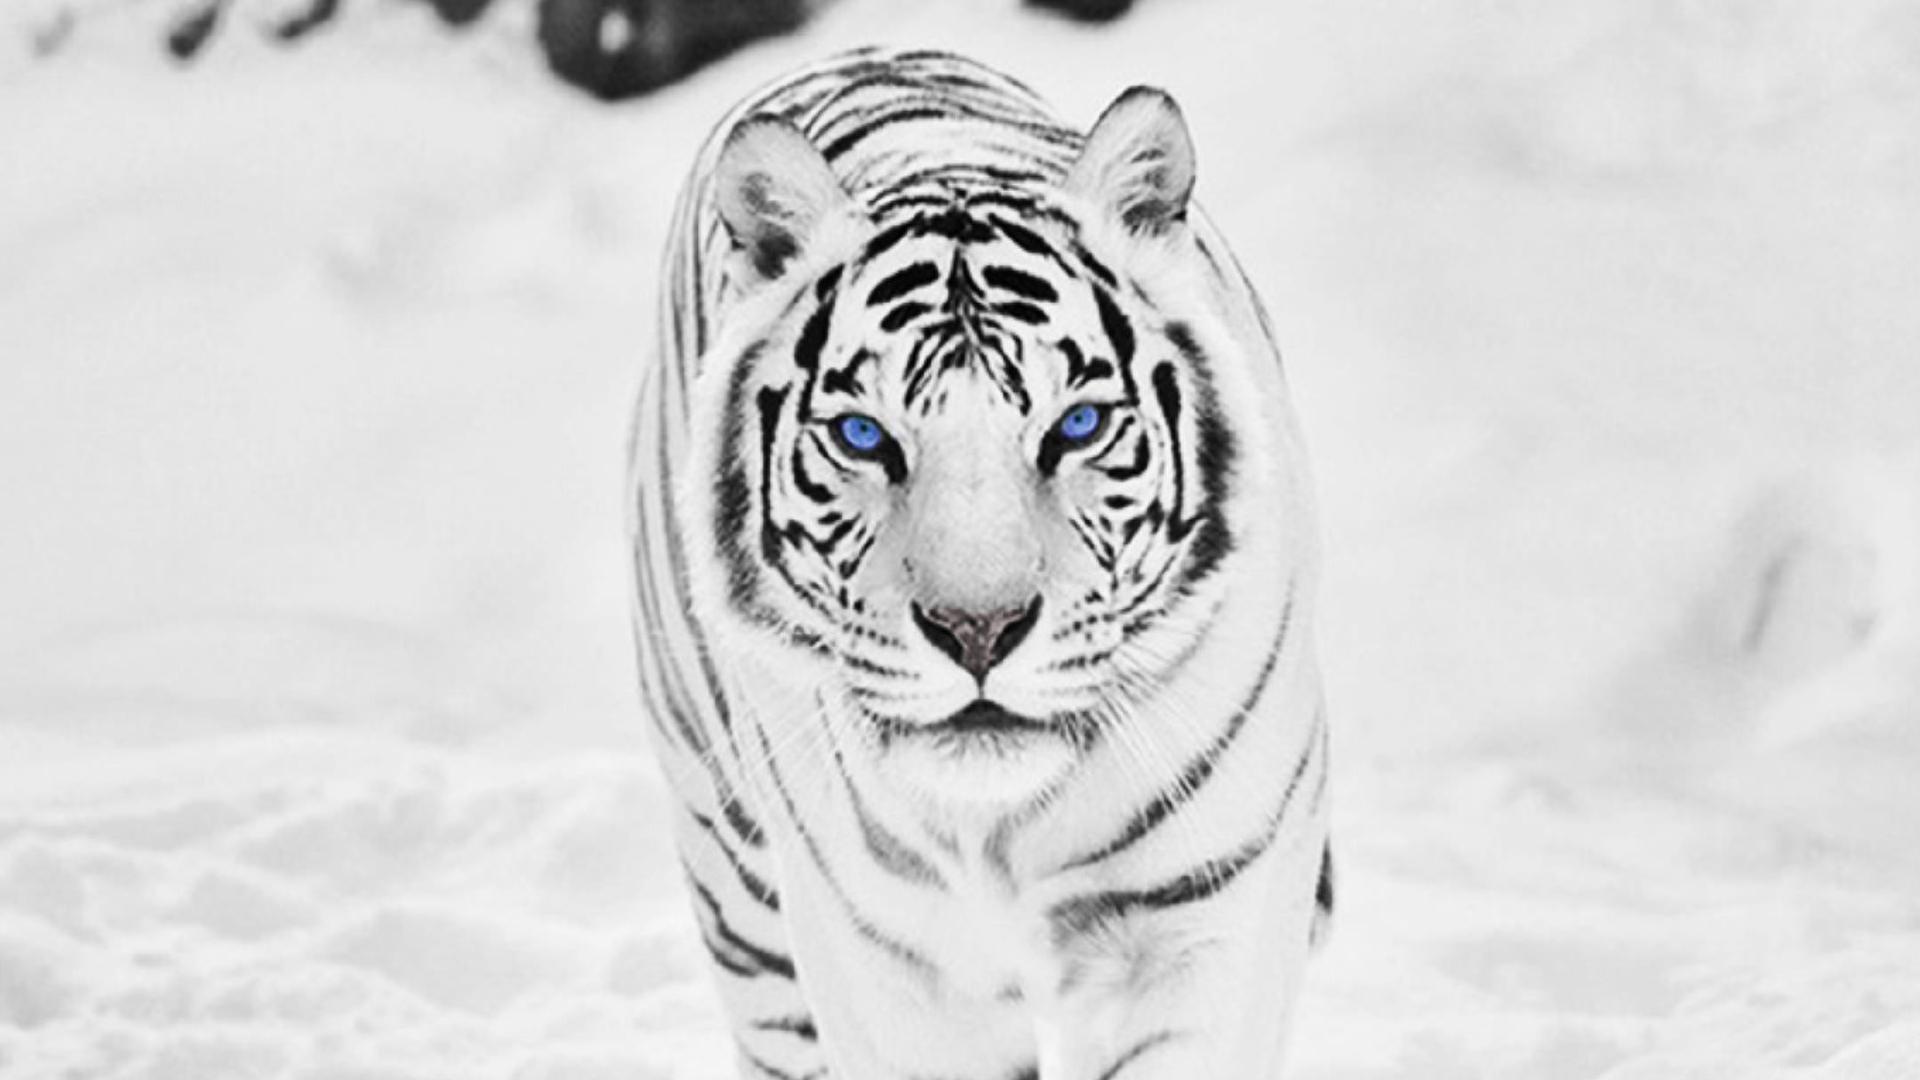 White Tiger Wallpaper Photo, hd walepaper, free wallpaper